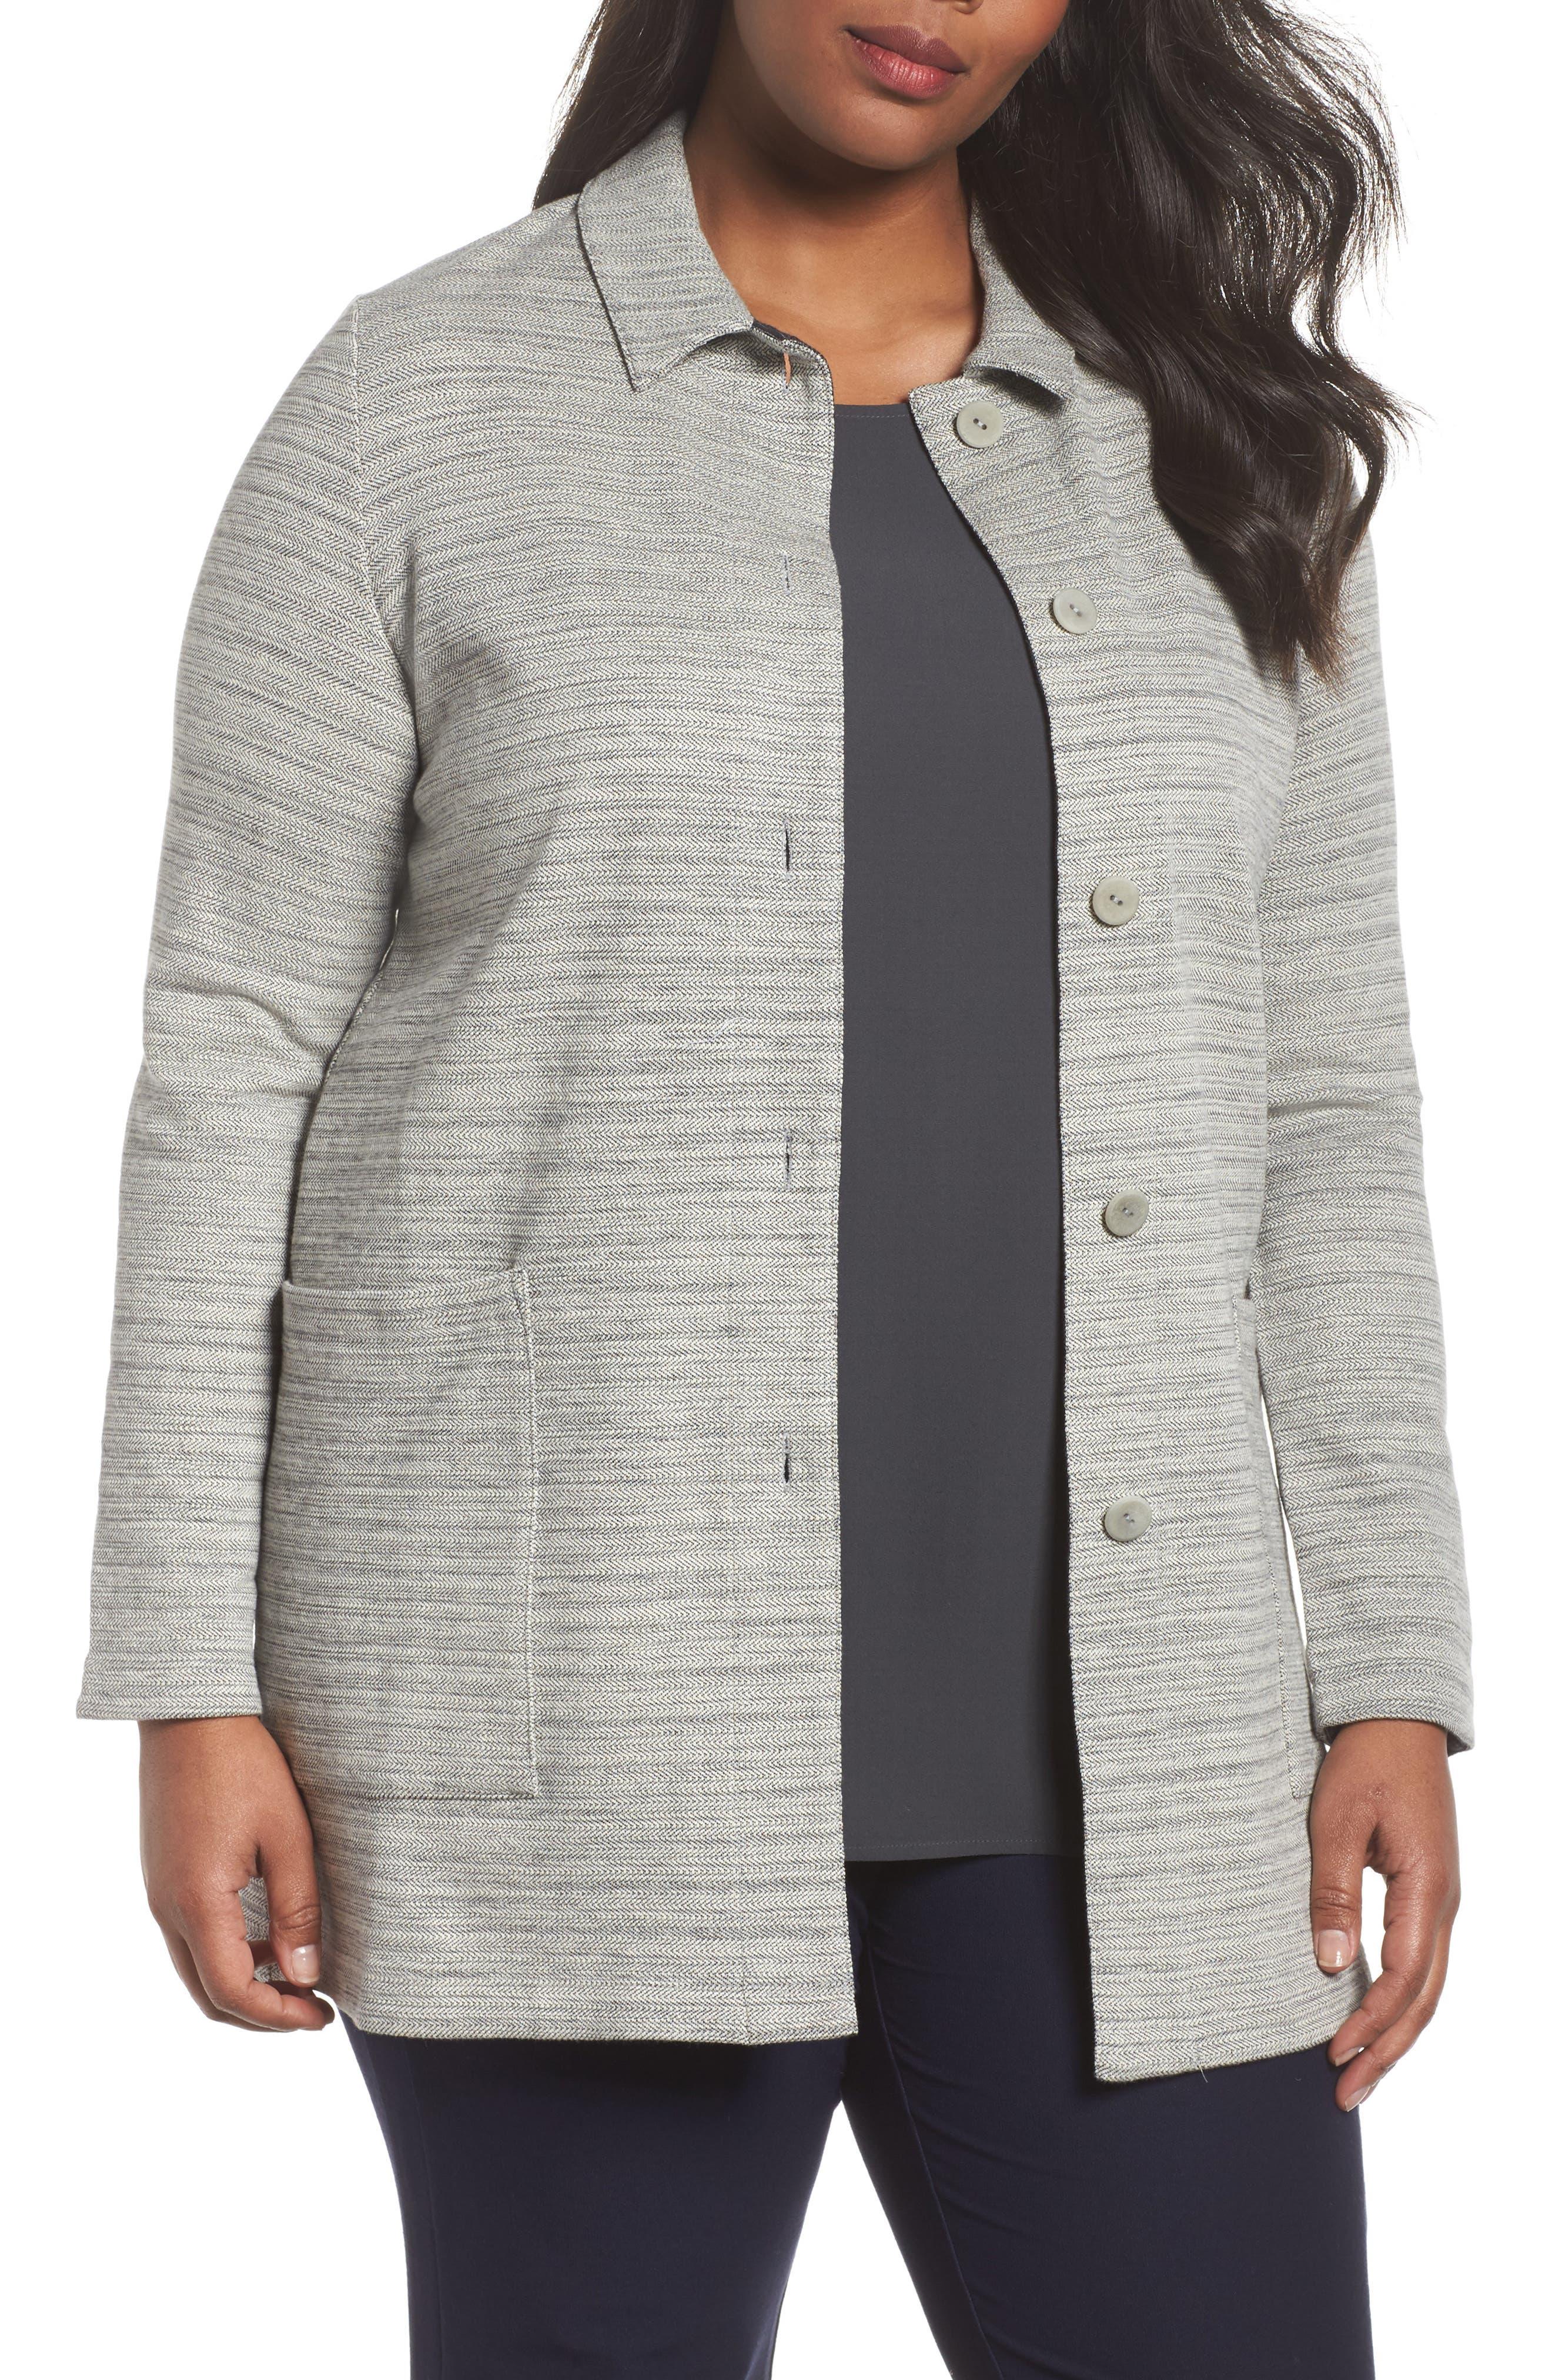 Cotton Blend Tweed Jacket,                         Main,                         color, Dark Pearl